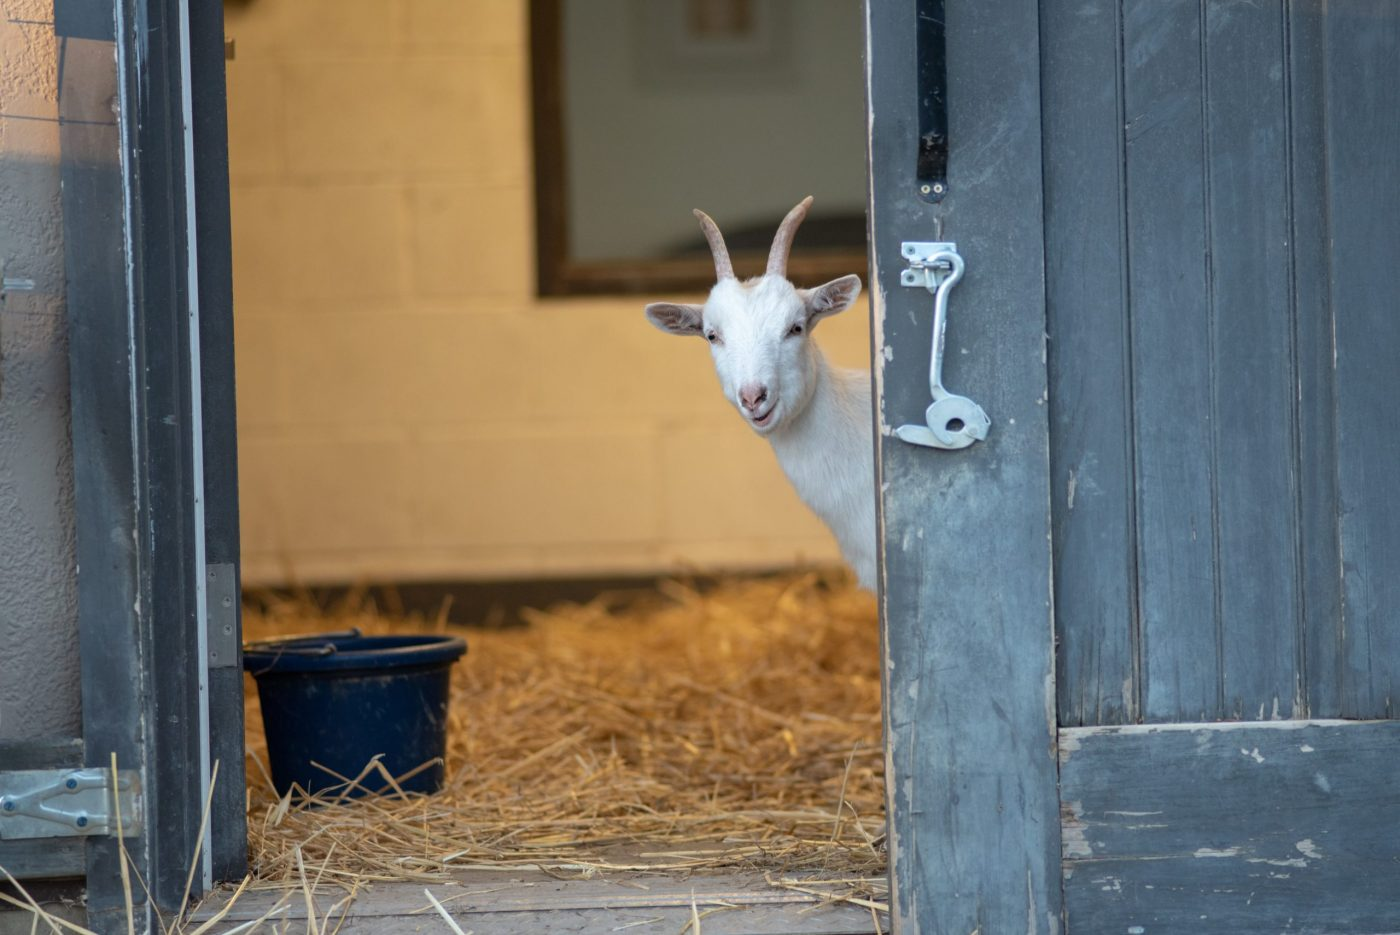 Sadie goat